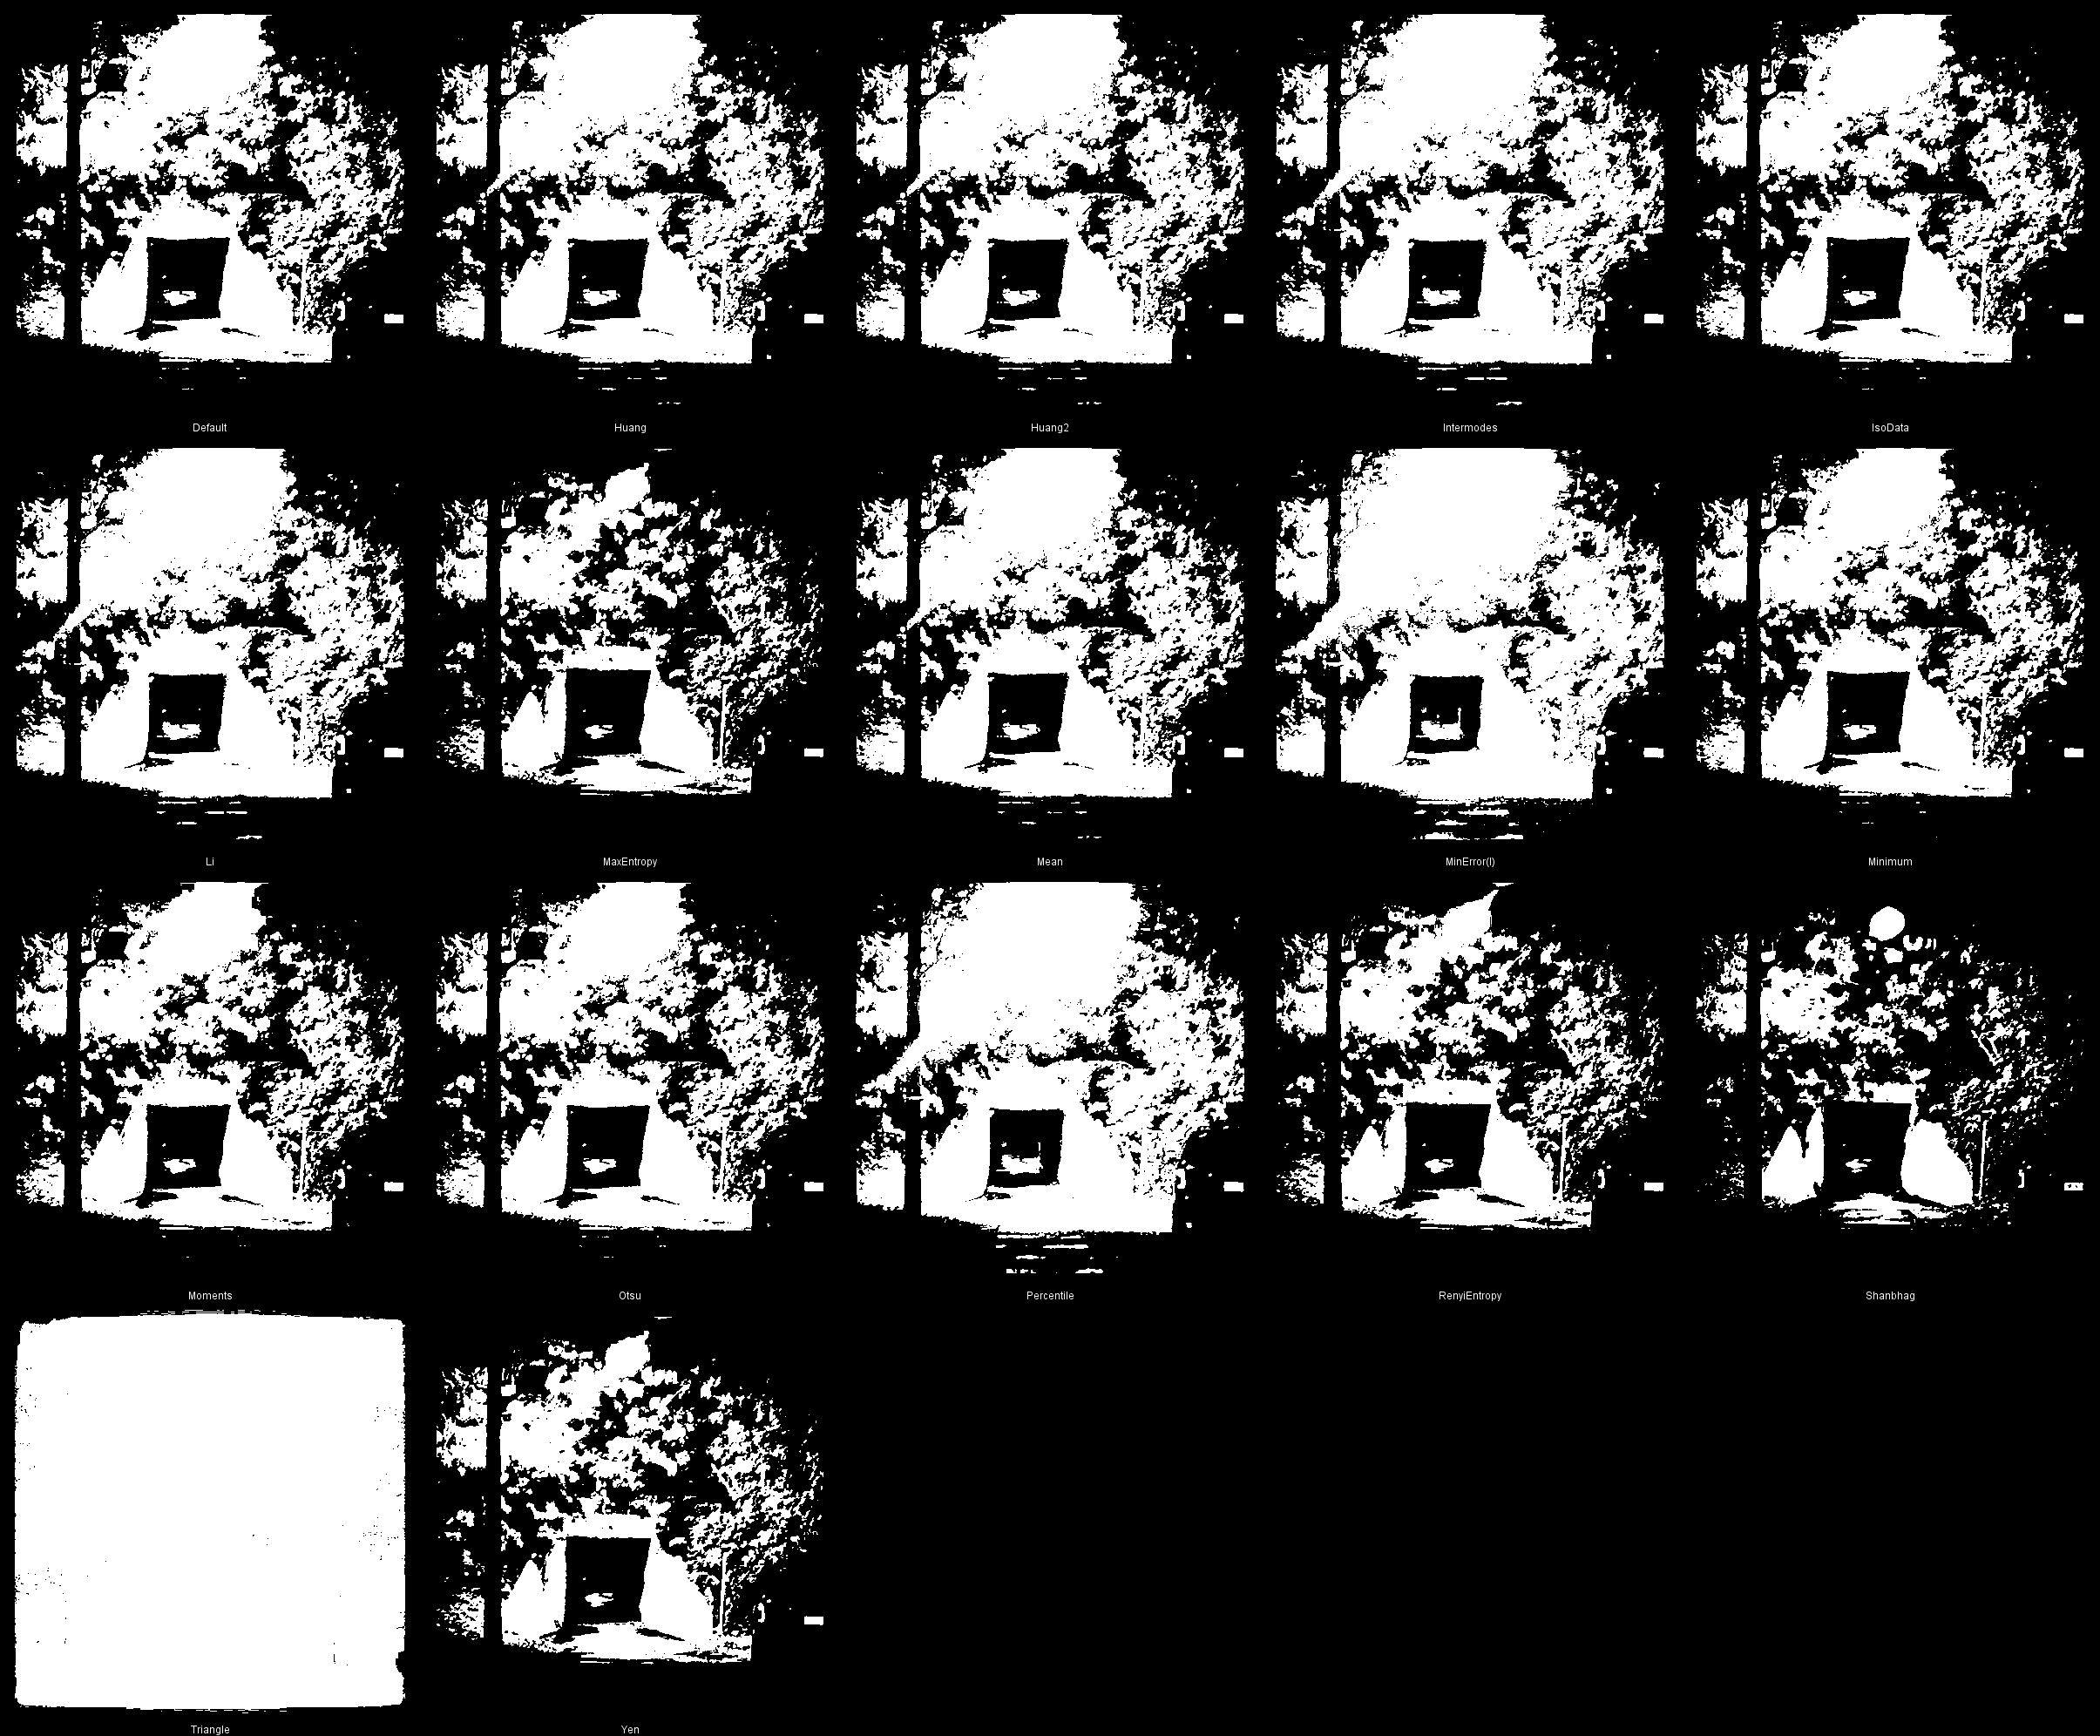 rp-tunnl1-8-bit-to-thrsholdmontag